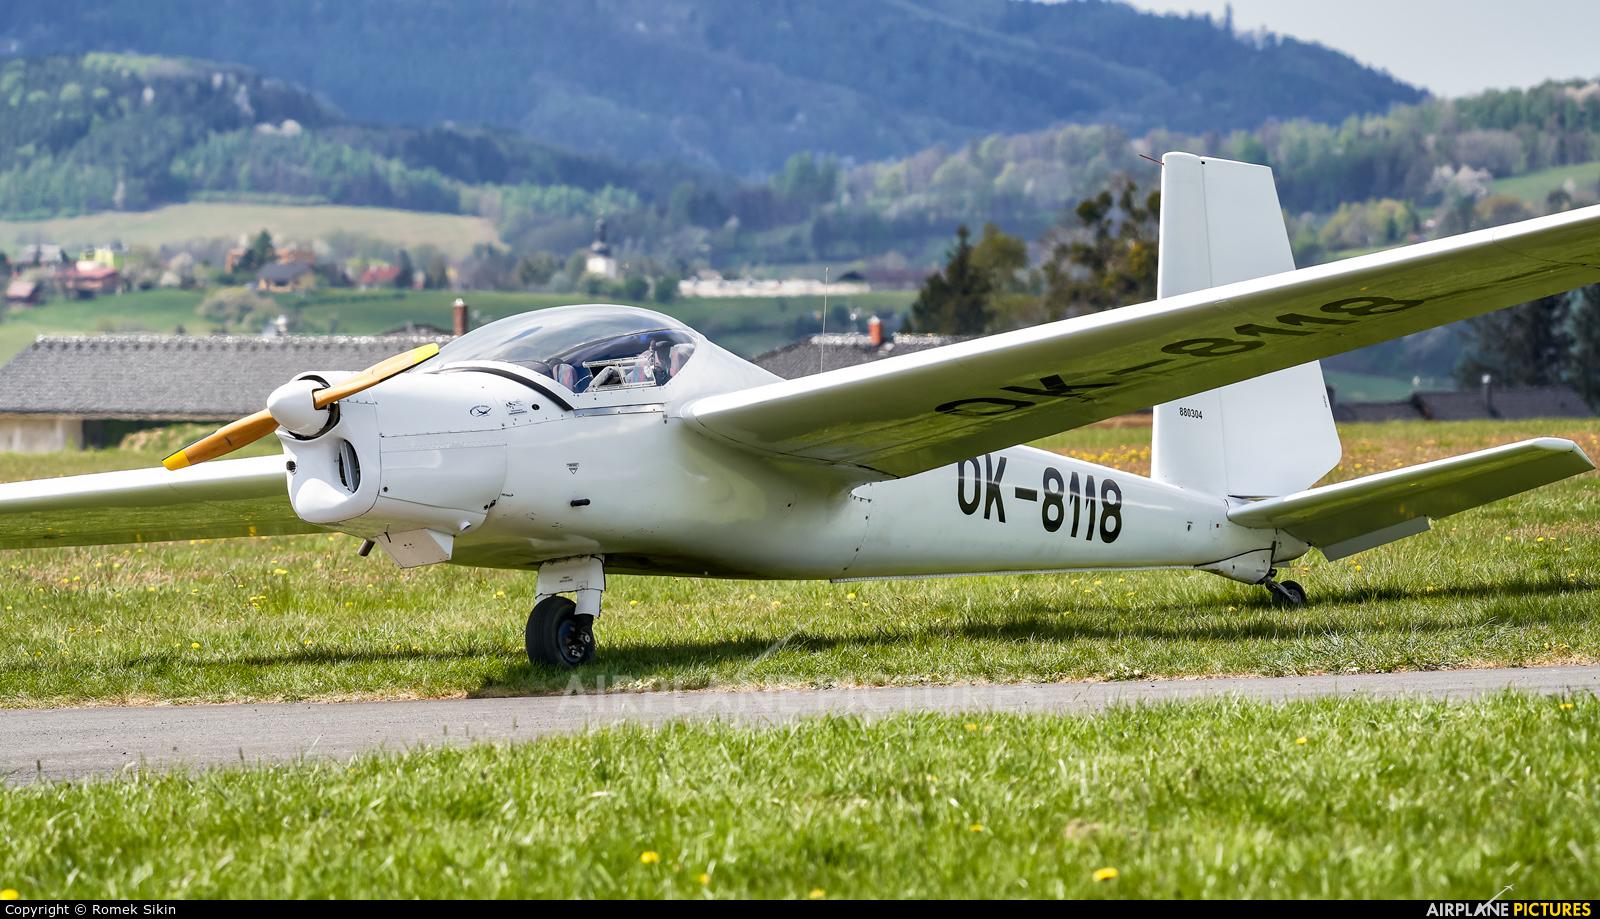 Aeroklub Frýdlant OK-8118 aircraft at Frýdlant nad Ostravicí